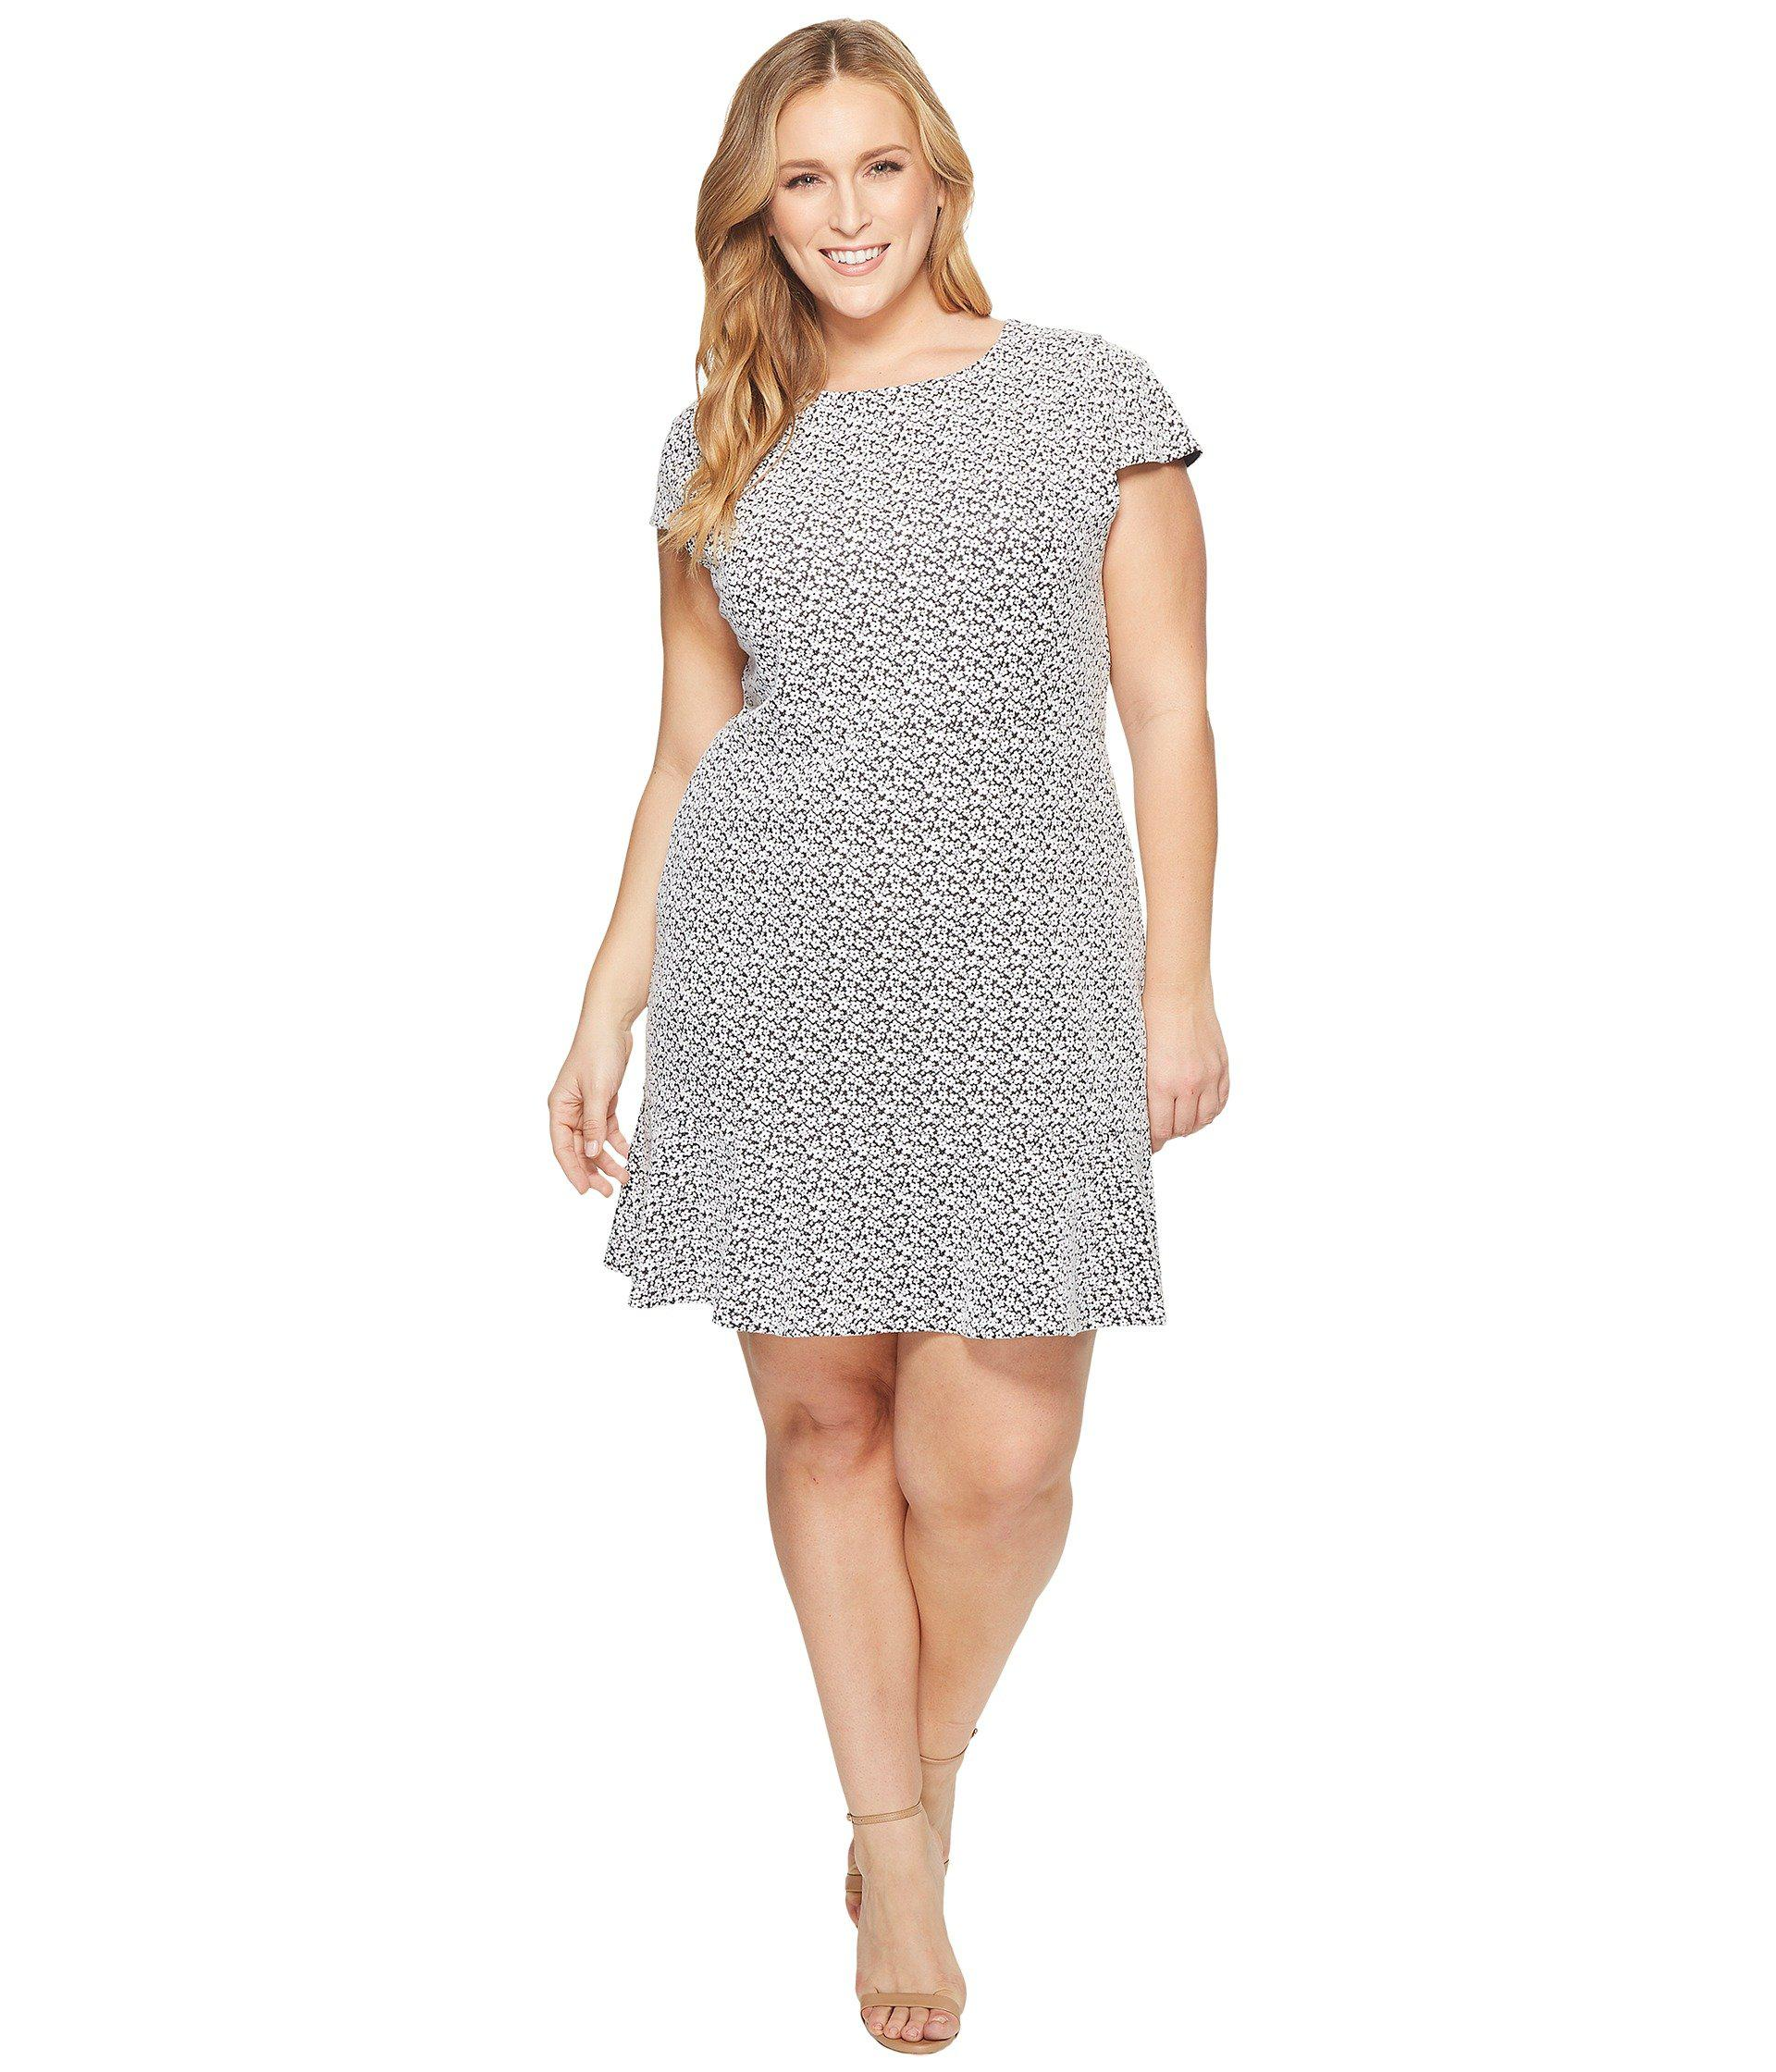 5b1a46ffc11 MICHAEL Michael Kors. Women s Plus Size Jacquard Knit Short Sleeve Flounce  Dress